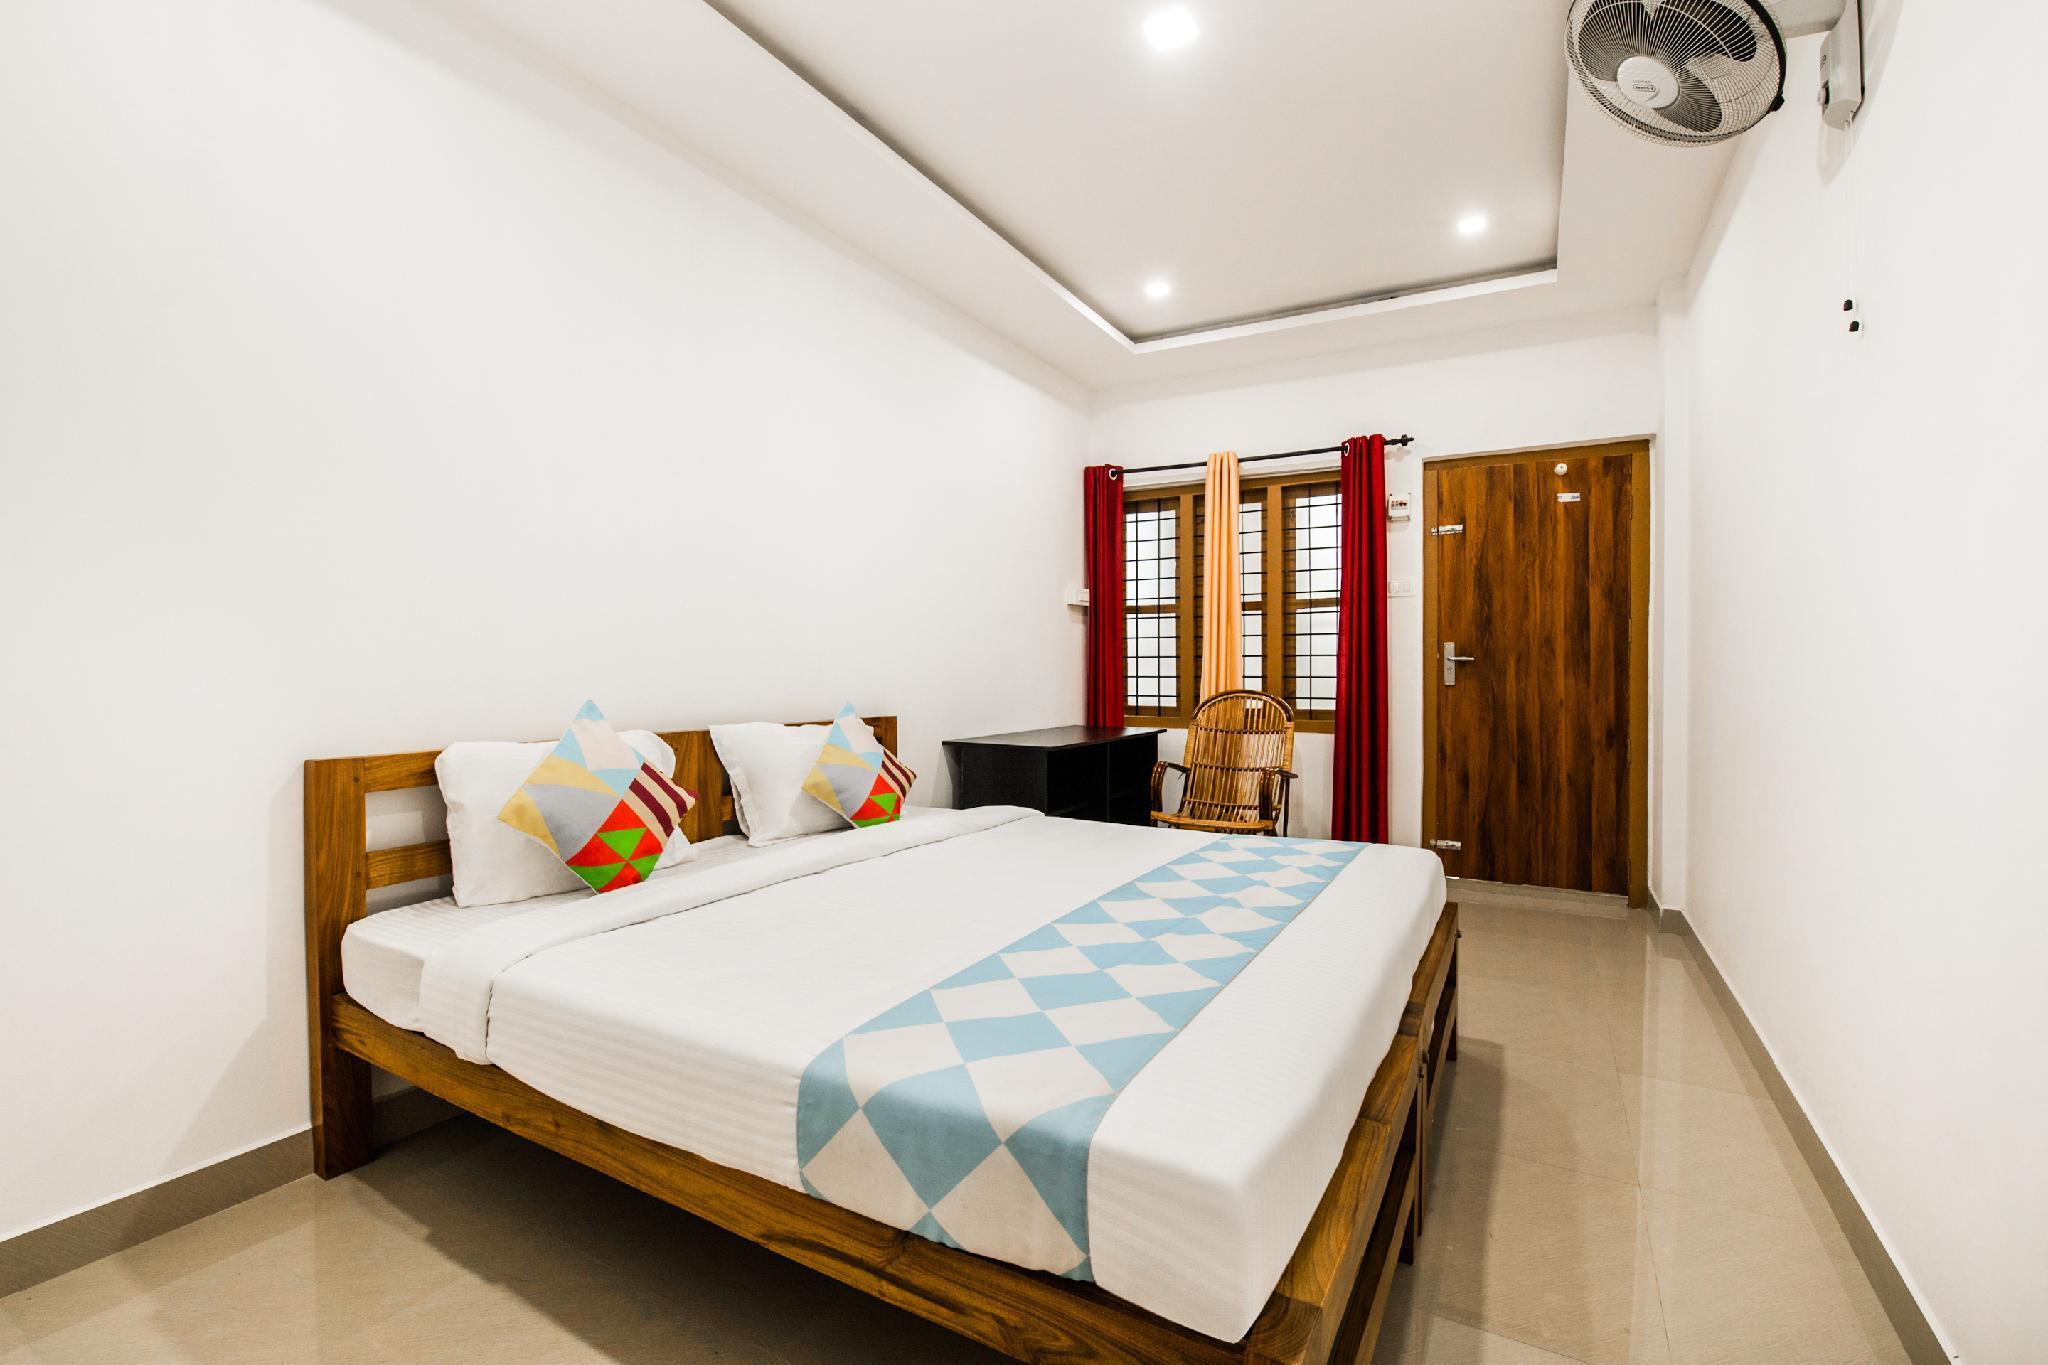 OYO 60167 Well Furnished Hotel Room In Wayanad